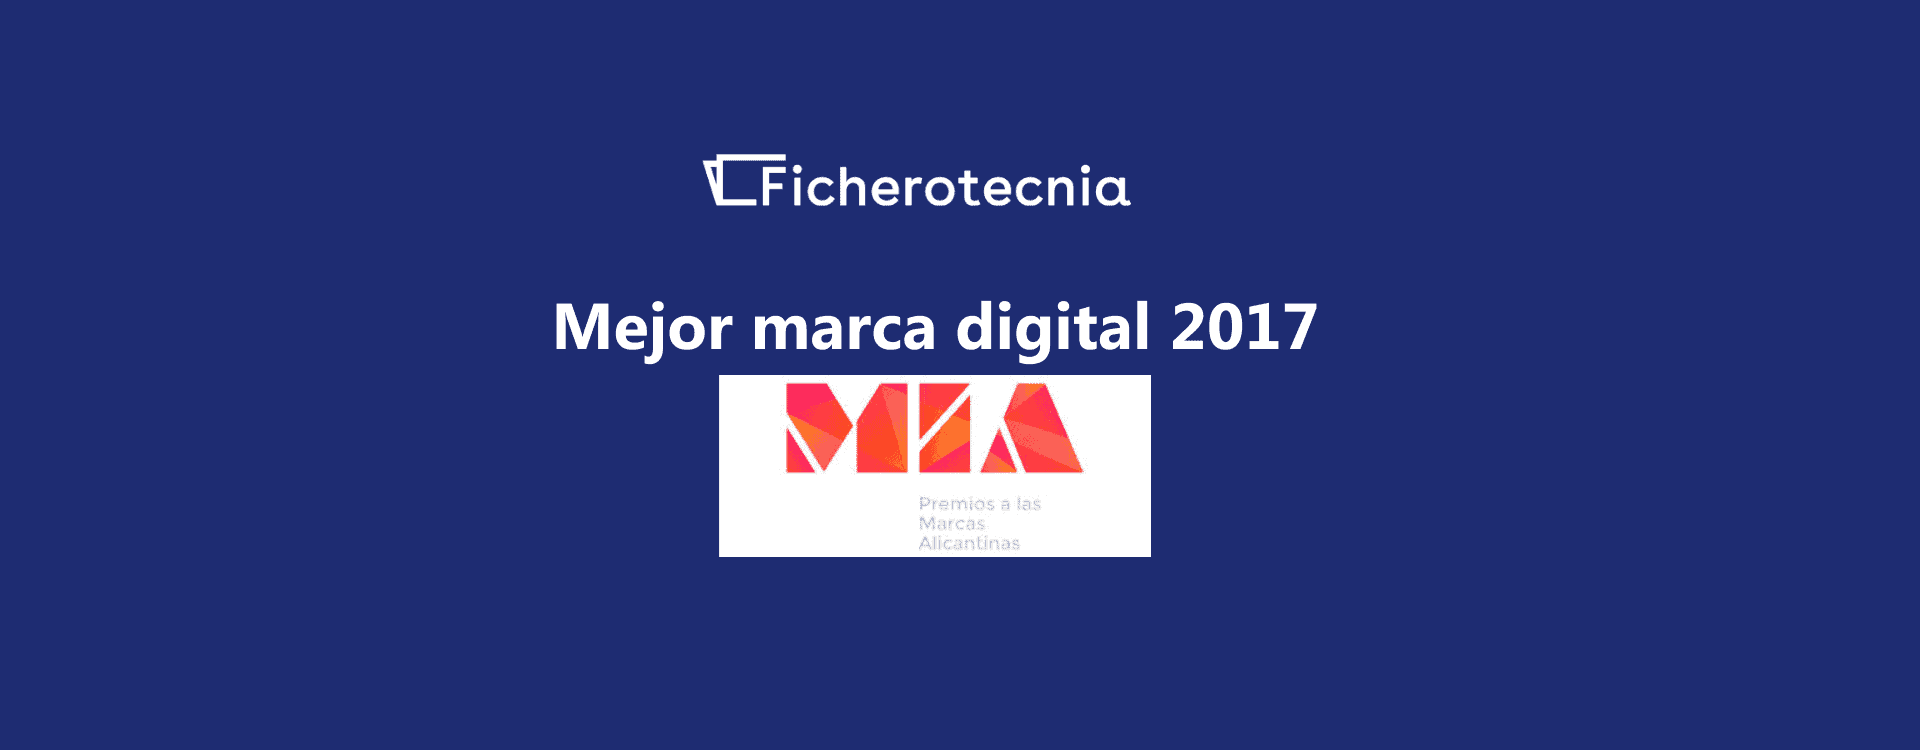 ficherotecnia-mejor-marca-digital-2017